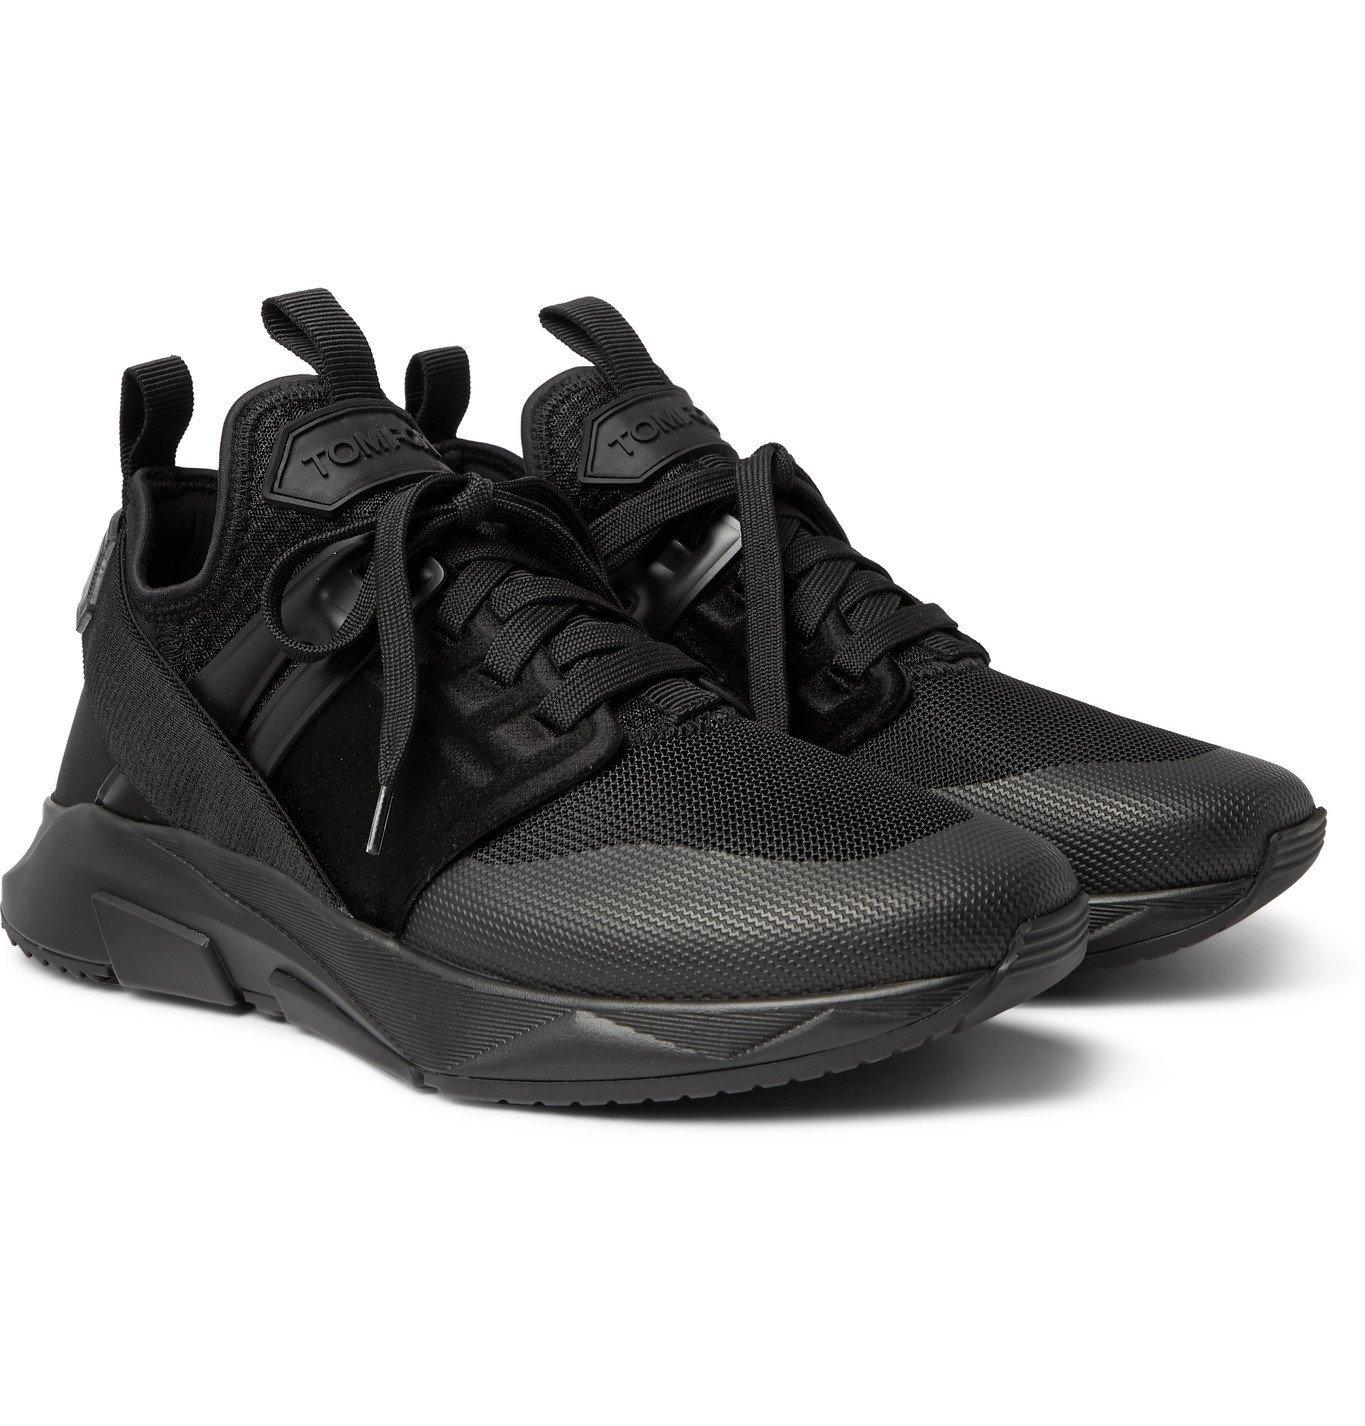 Photo: TOM FORD - Jago Neoprene, Mesh and Nylon Sneakers - Black